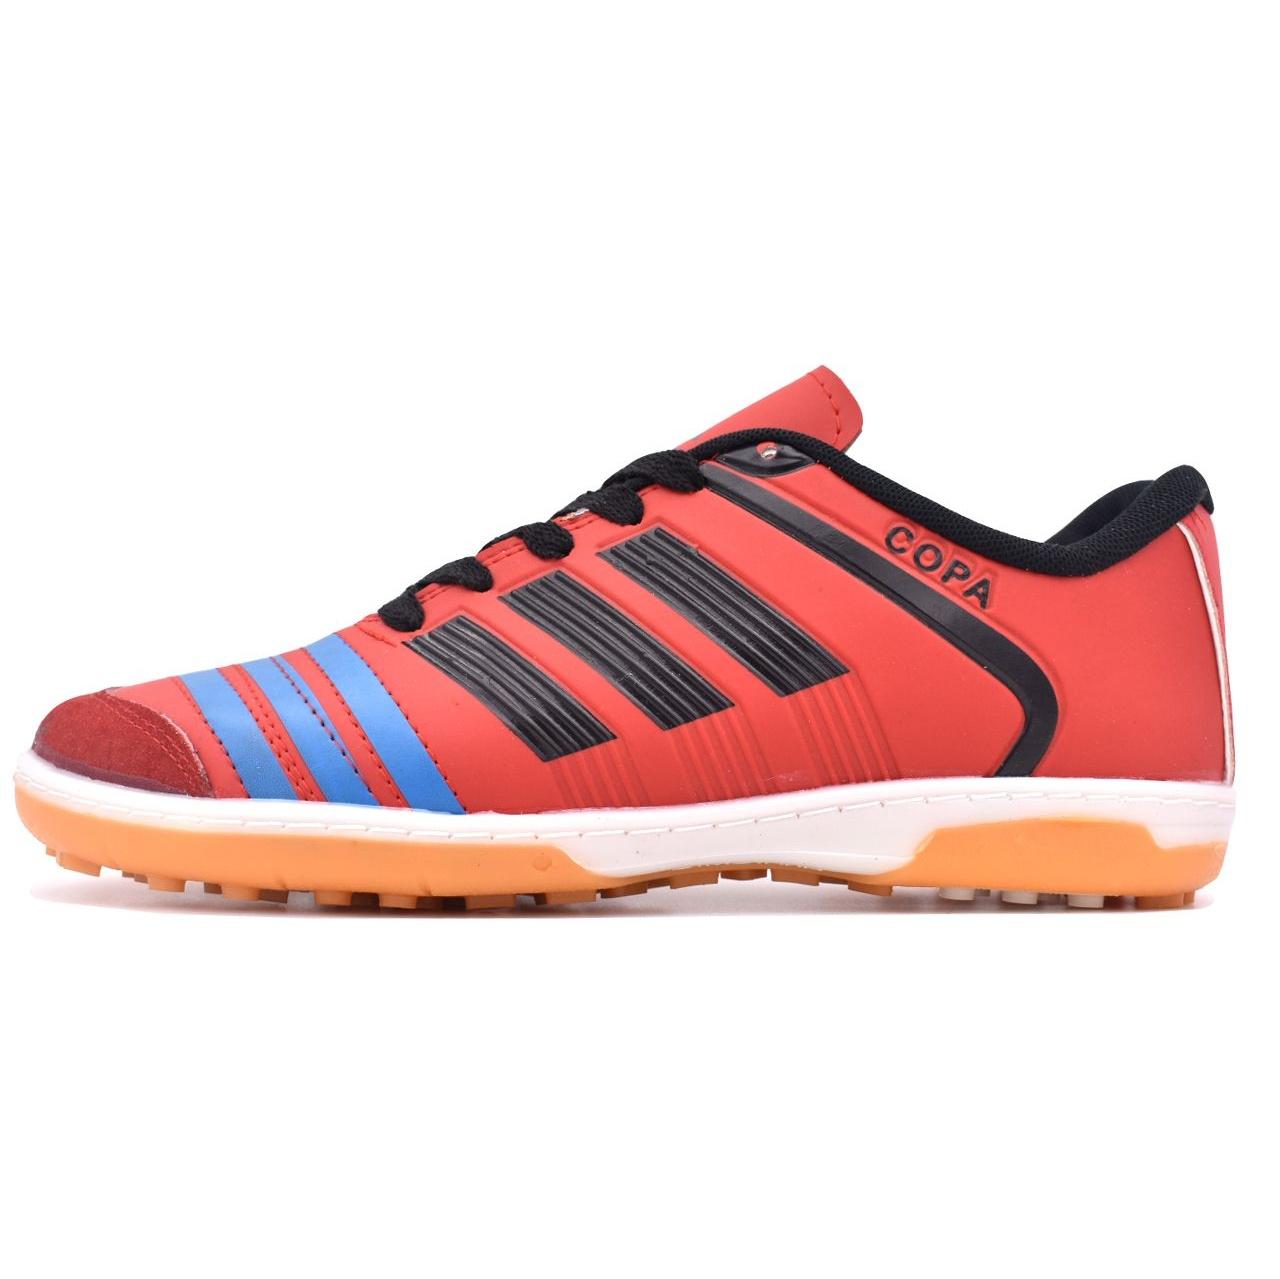 قیمت خرید کفش فوتبال مردانه کد 1100 اورجینال